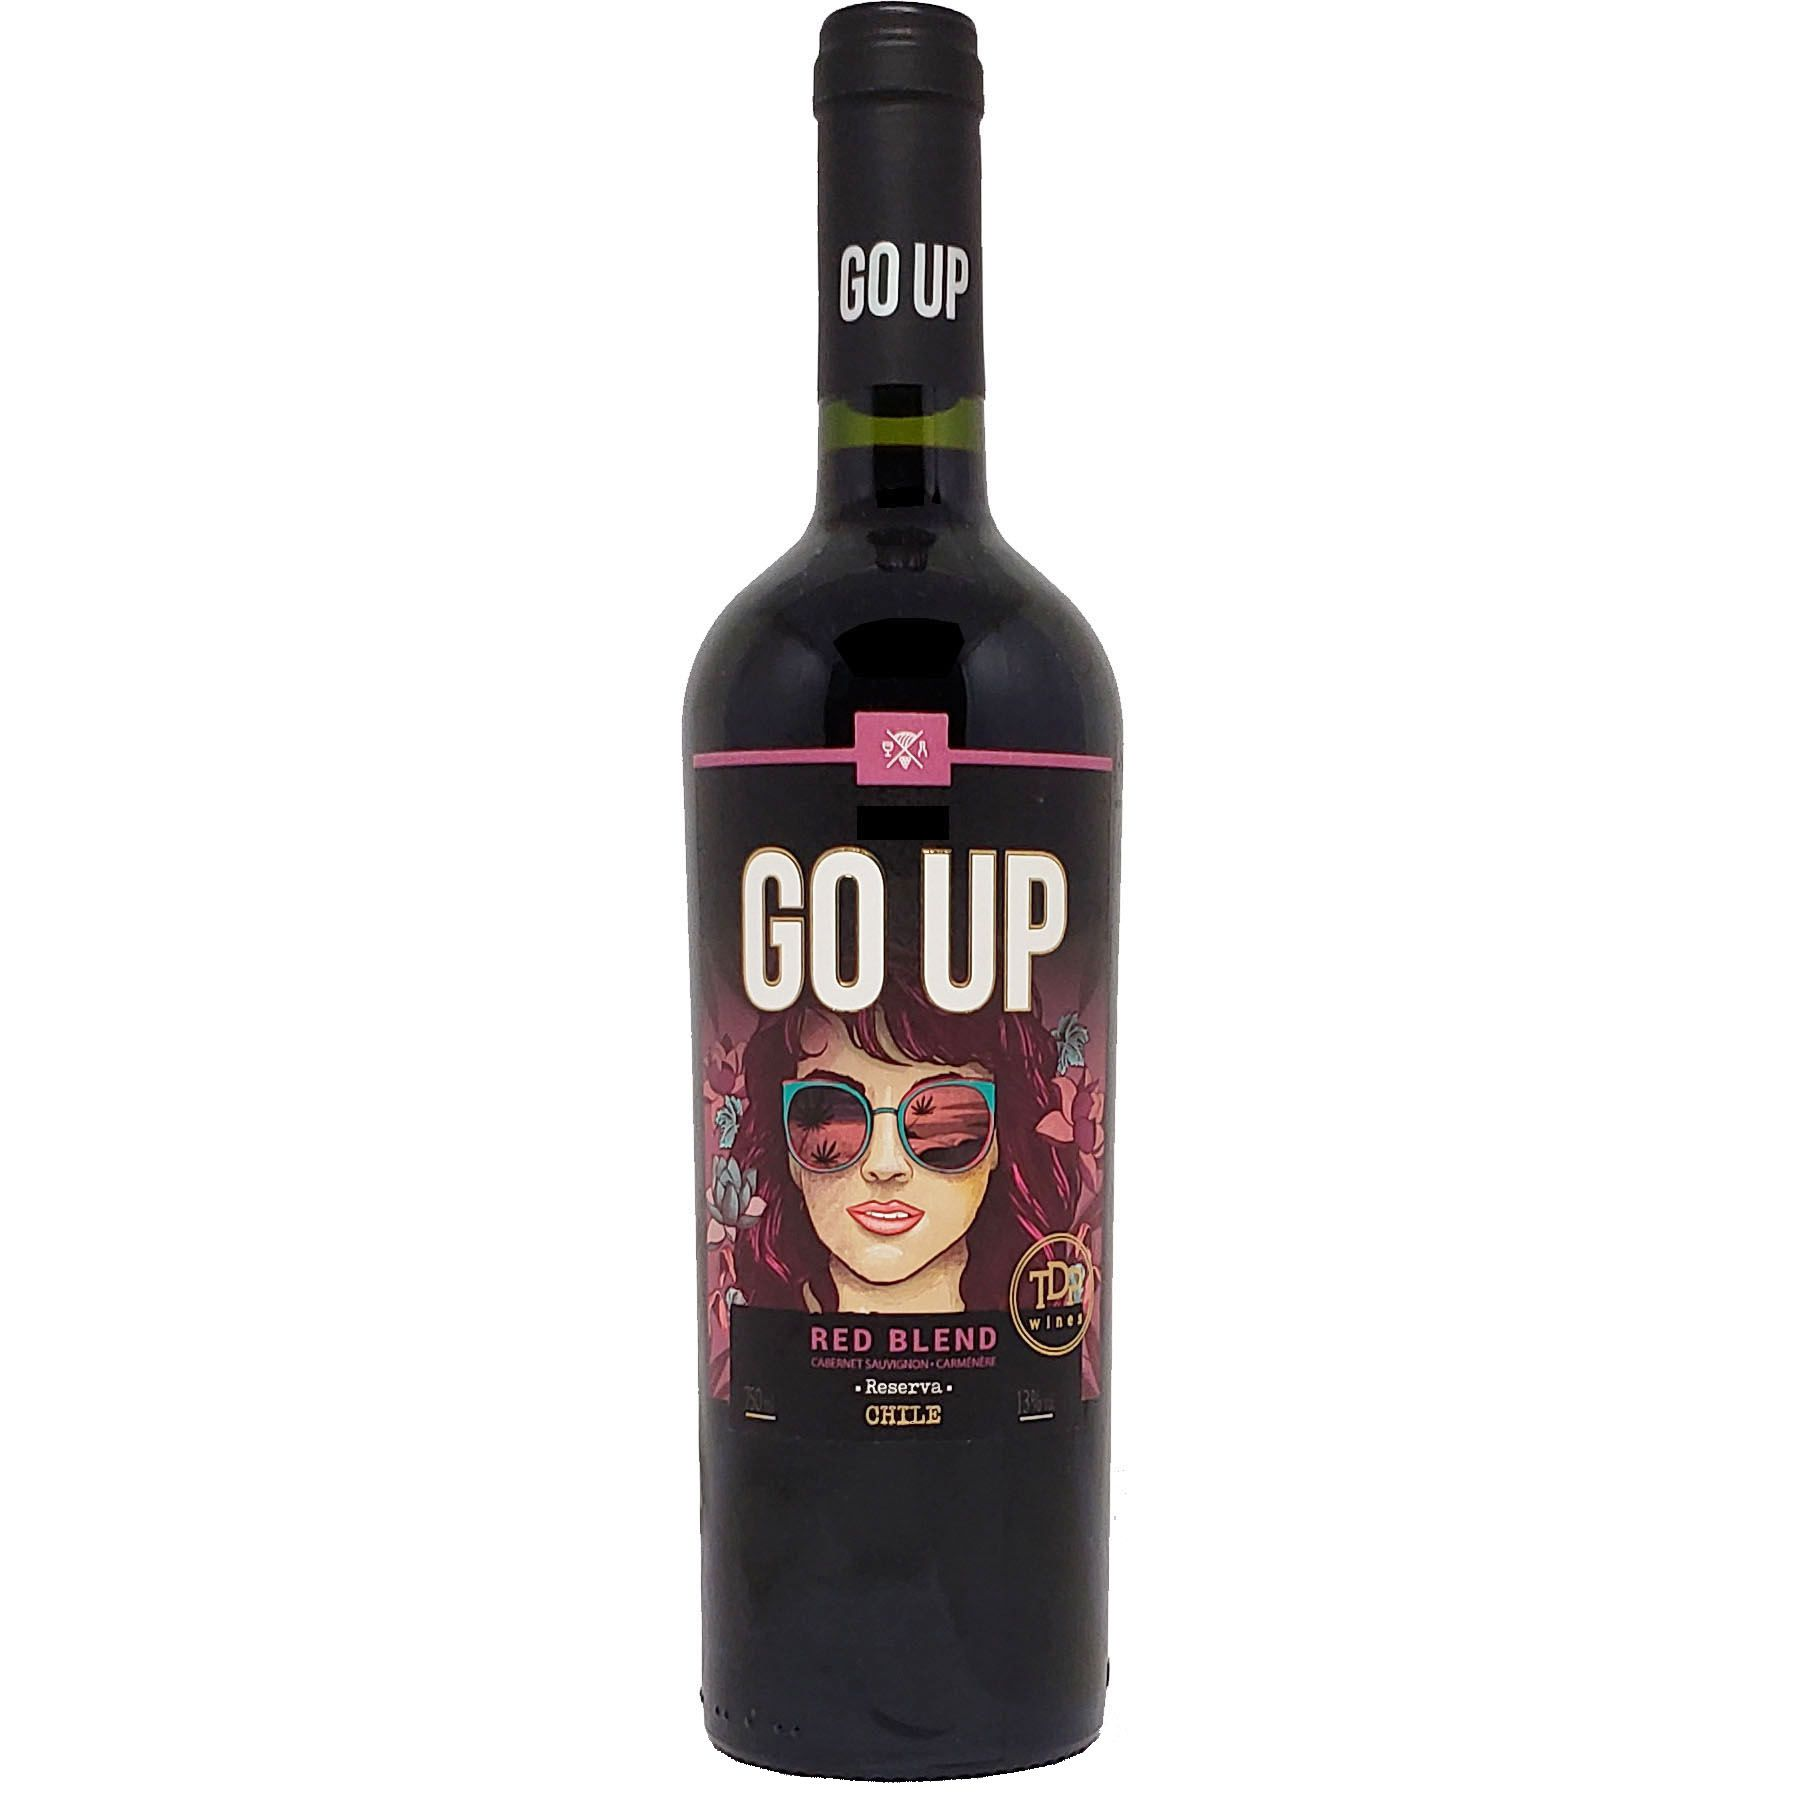 Vinho Tinto Go Up Red Blend Cabernet Sauvignon - Camenere Reserva - 750ml -